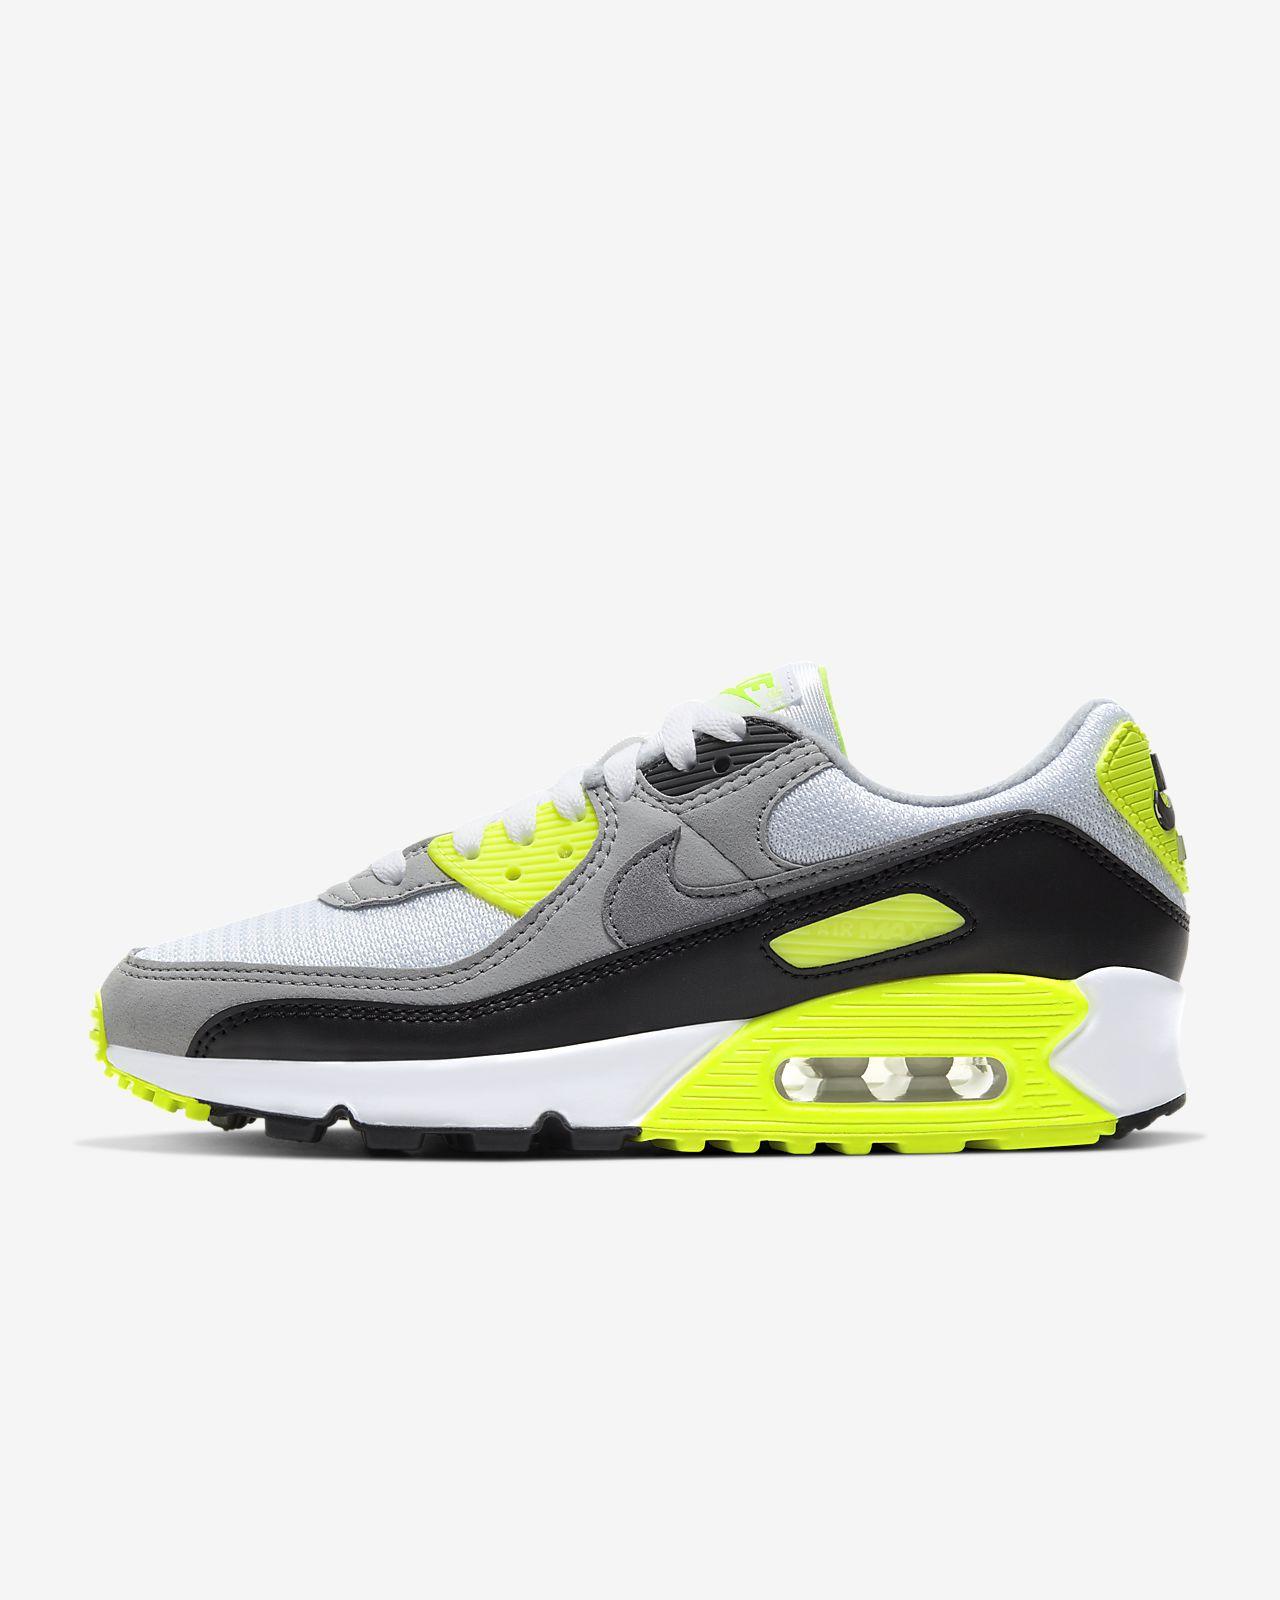 Nike Air Max 90-sko til kvinder